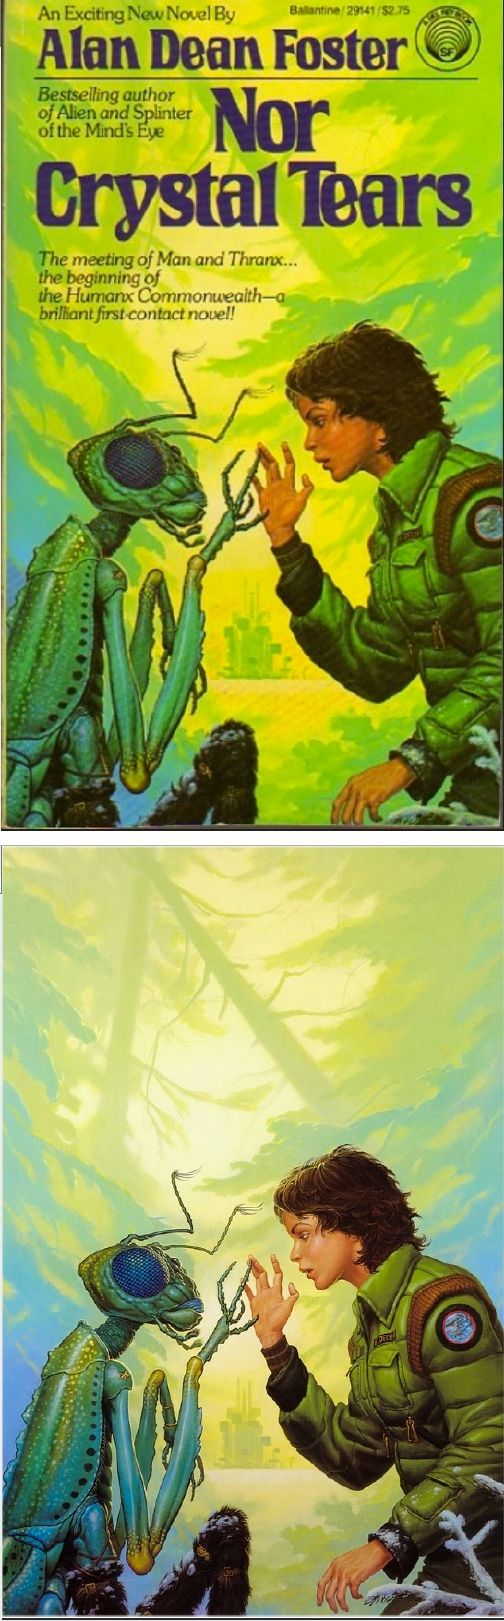 MICHAEL WHELAN - Nor Crystal Tears by Alan Dean Foster - 1982 Del Rey / Ballantine - cover by isfdb - print by michaelwhelan.com